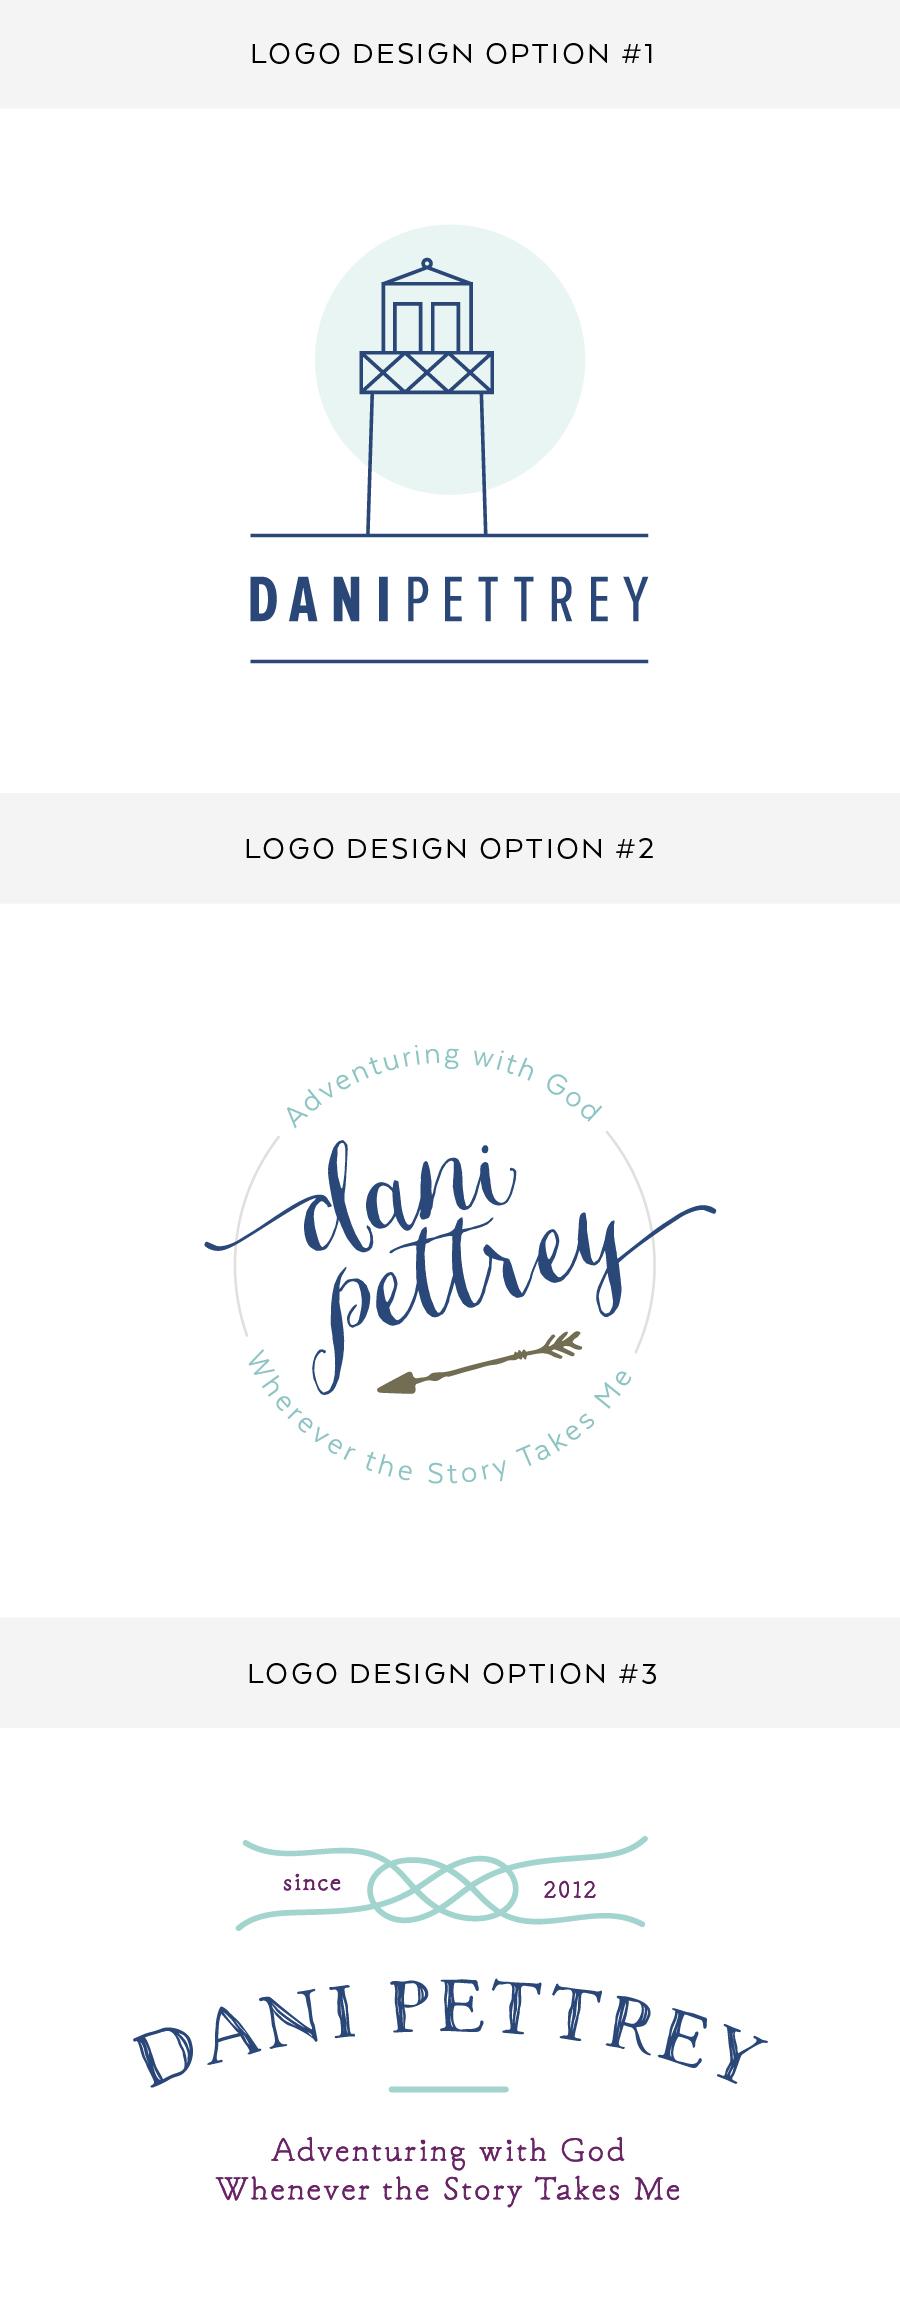 Author Dani Pettrey Brand Logo Design and   Branding - Feminine Logo Designs #Coastal #Beach #Ocean #Design #Modern Script Font Logo #arrows